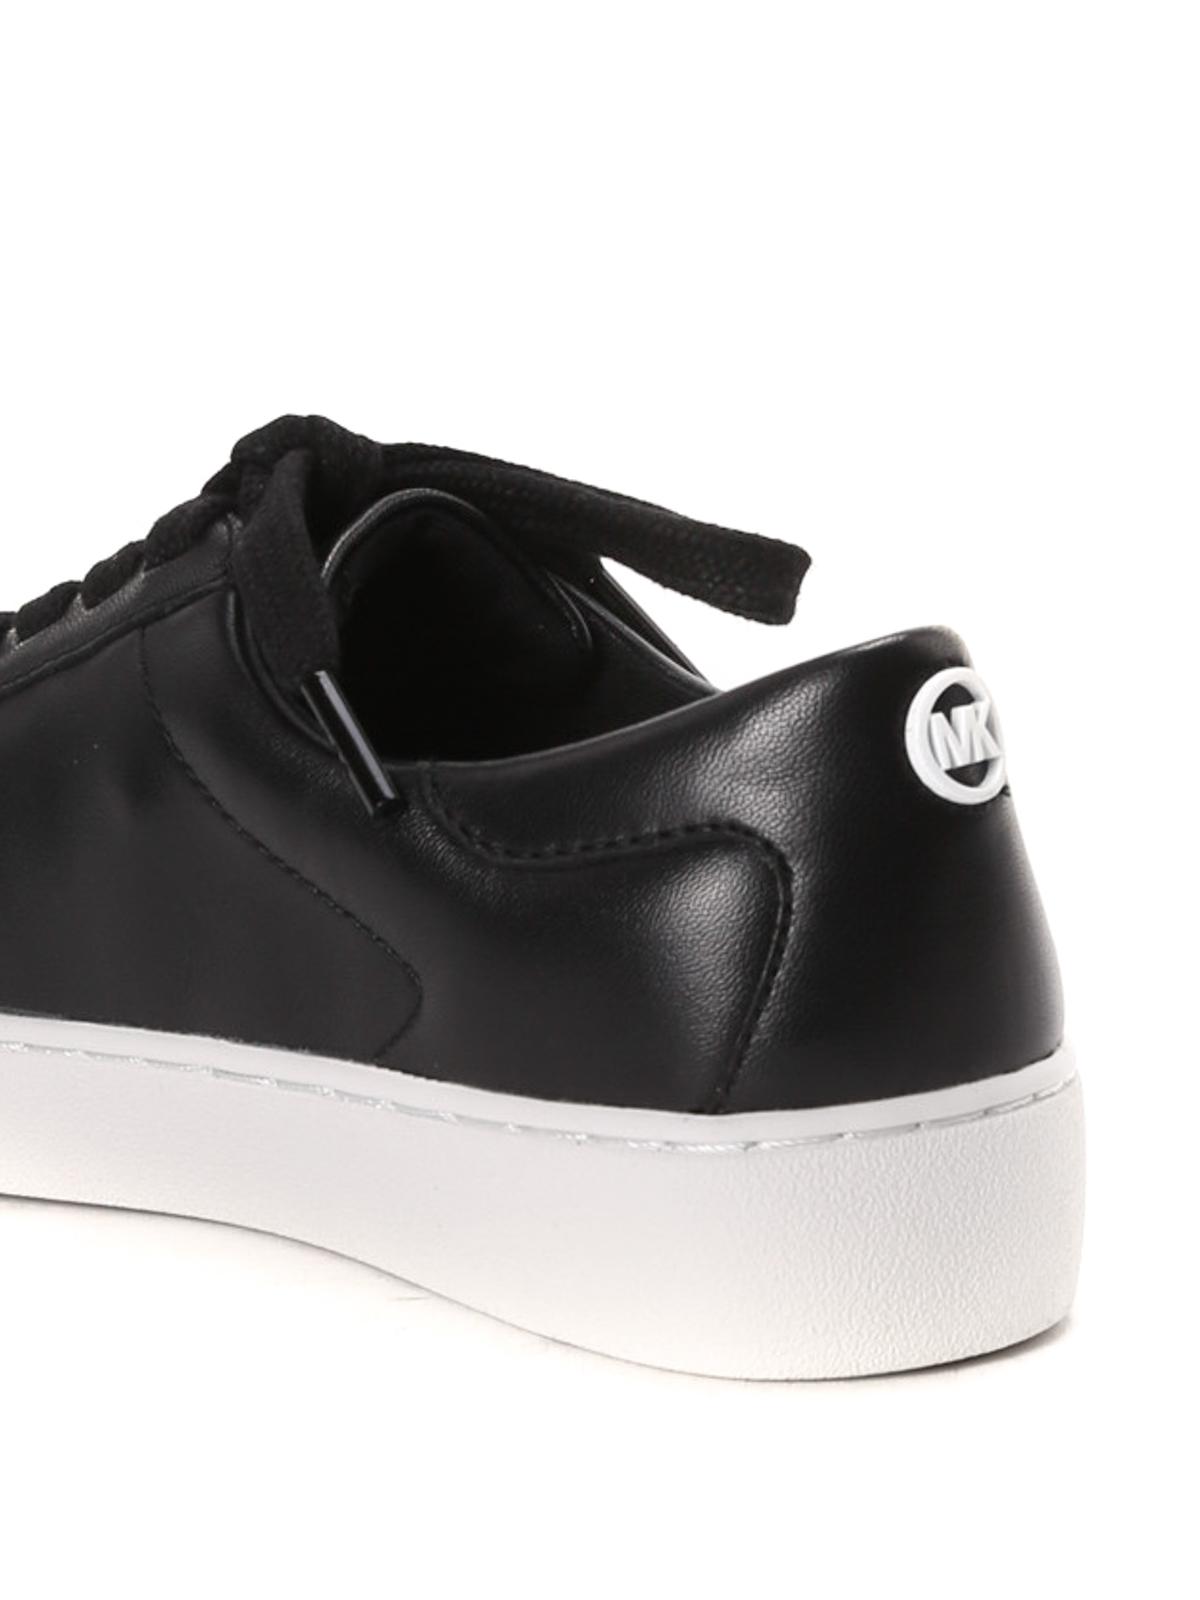 fc2cdb342c879 Michael Kors - Lola flower appliqué sneakers - trainers - 43R7LOFS1L012